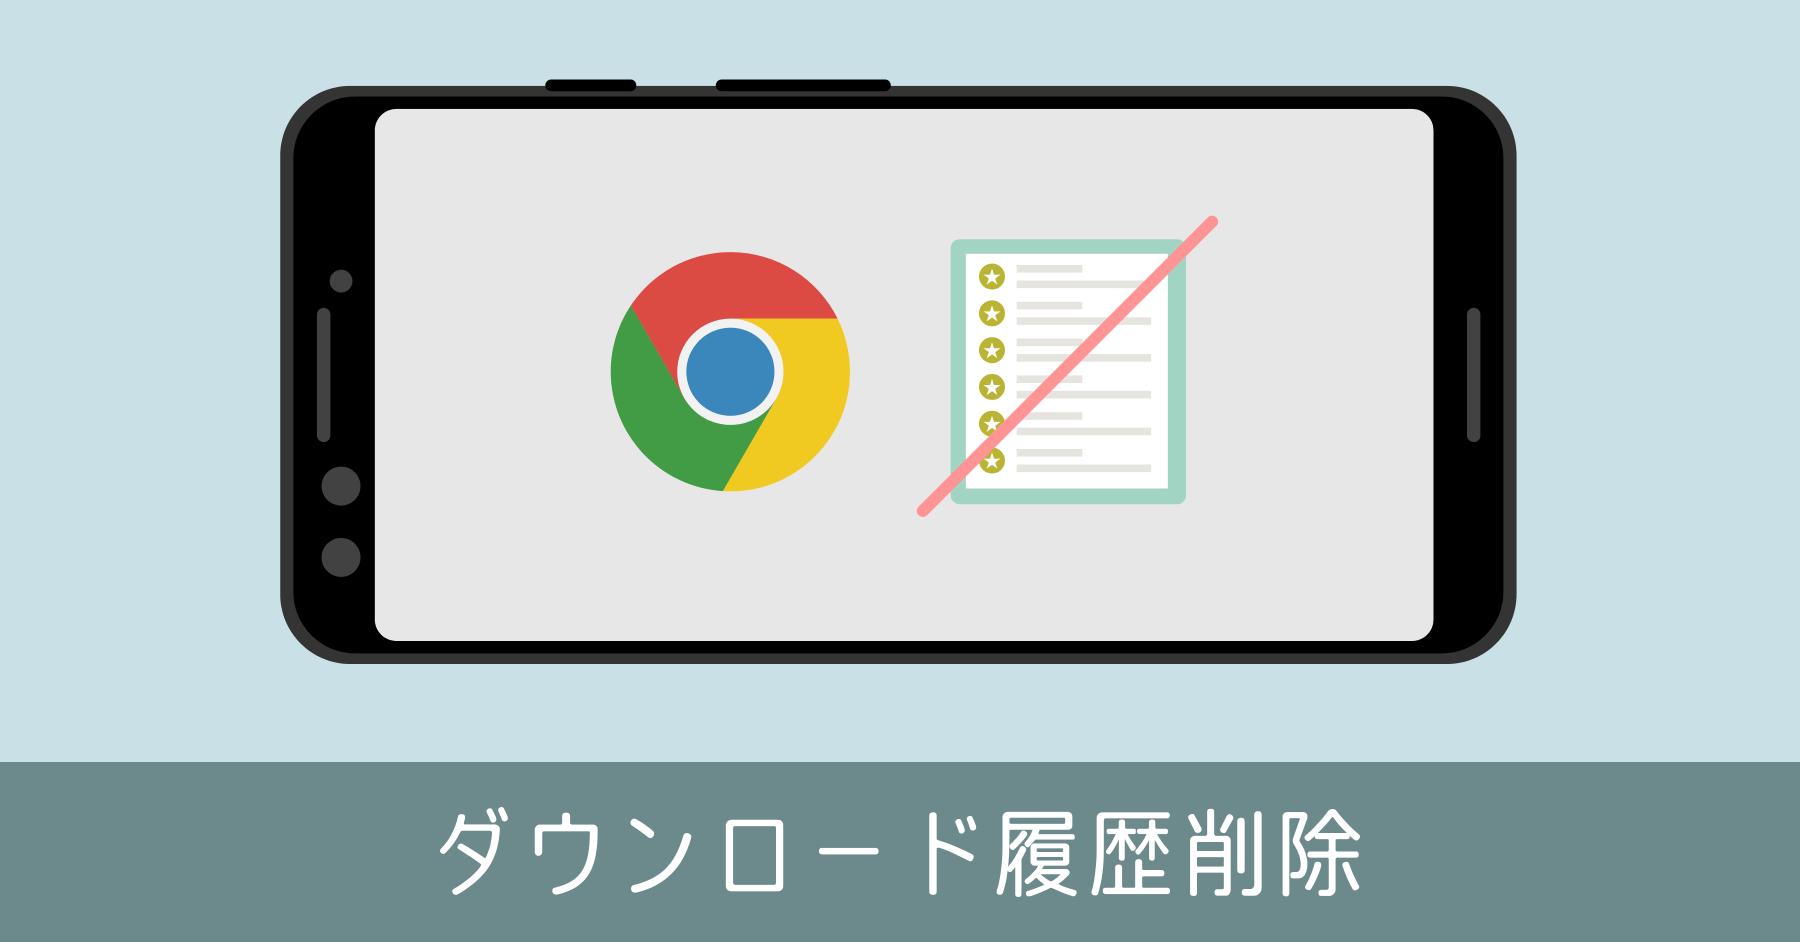 Androd Chrome ダウンロード履歴の削除